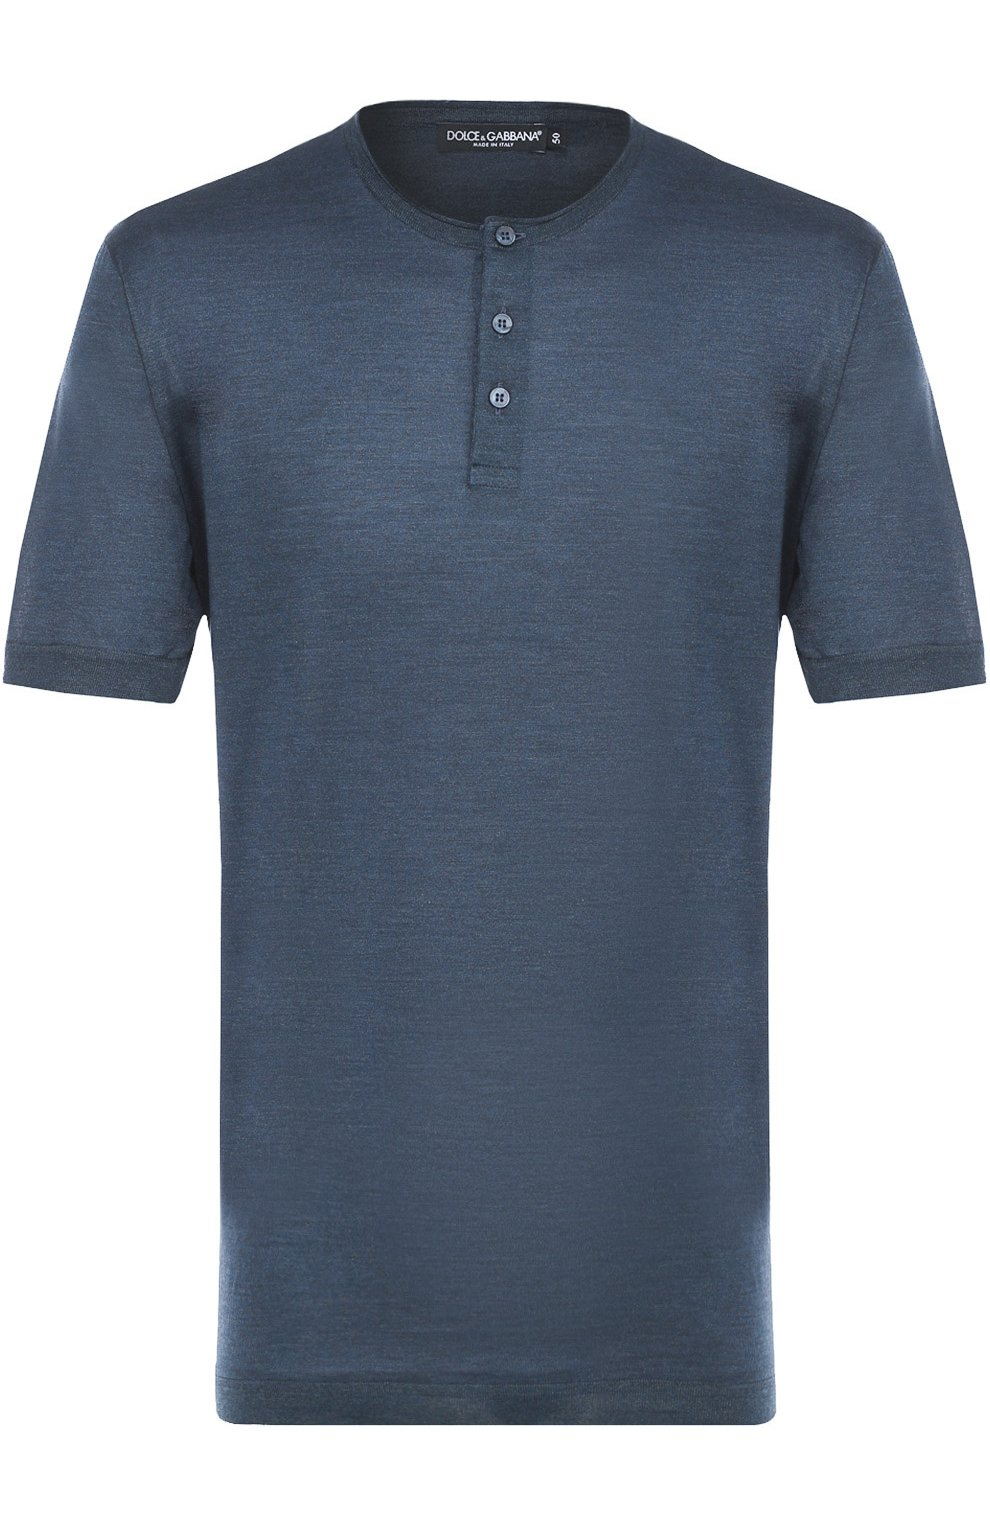 Хлопковая футболка хенли   Фото №1